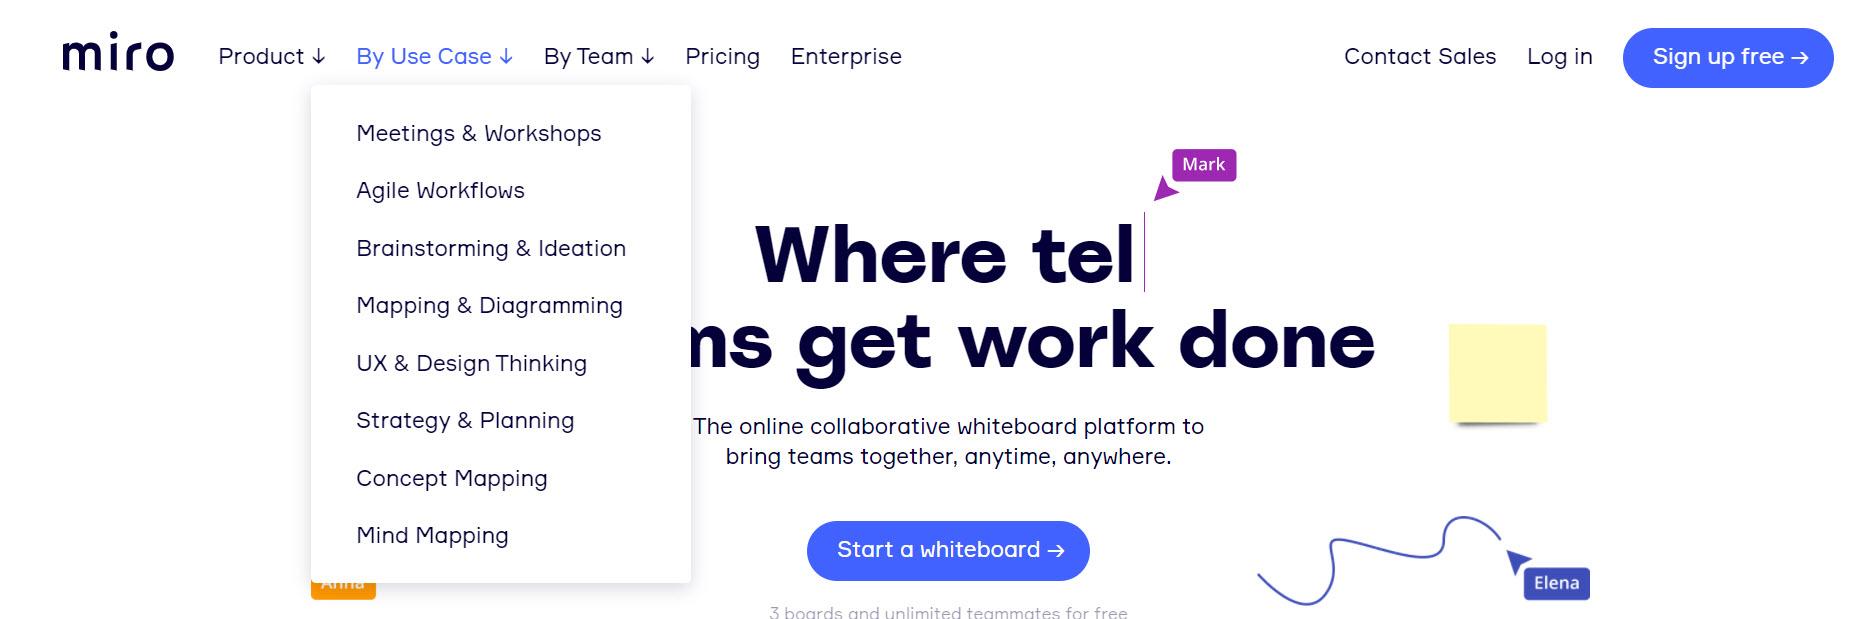 website menu example